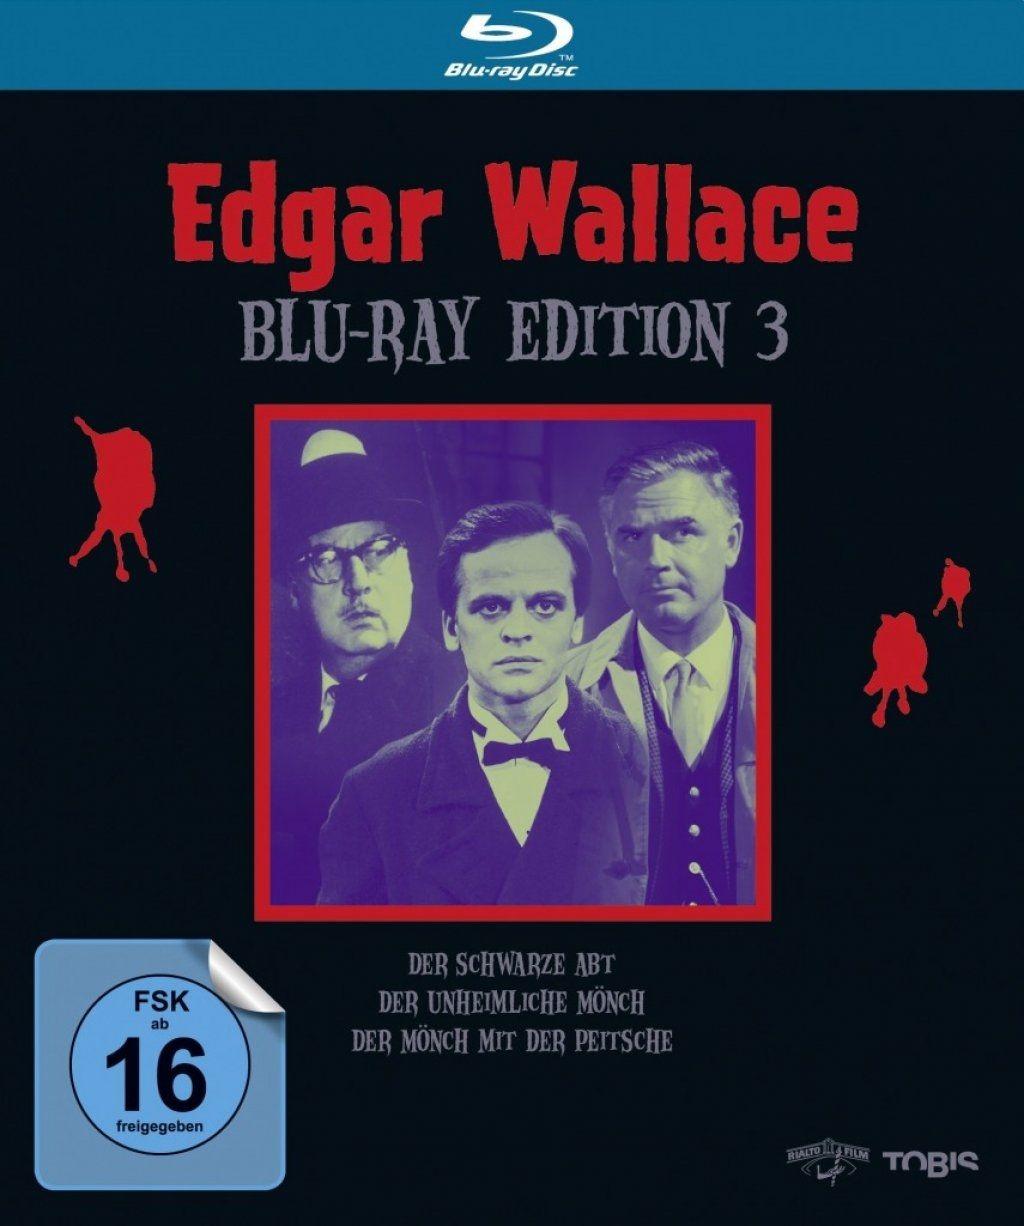 Edgar Wallace - Edition 3 (3 Discs) (BLURAY)